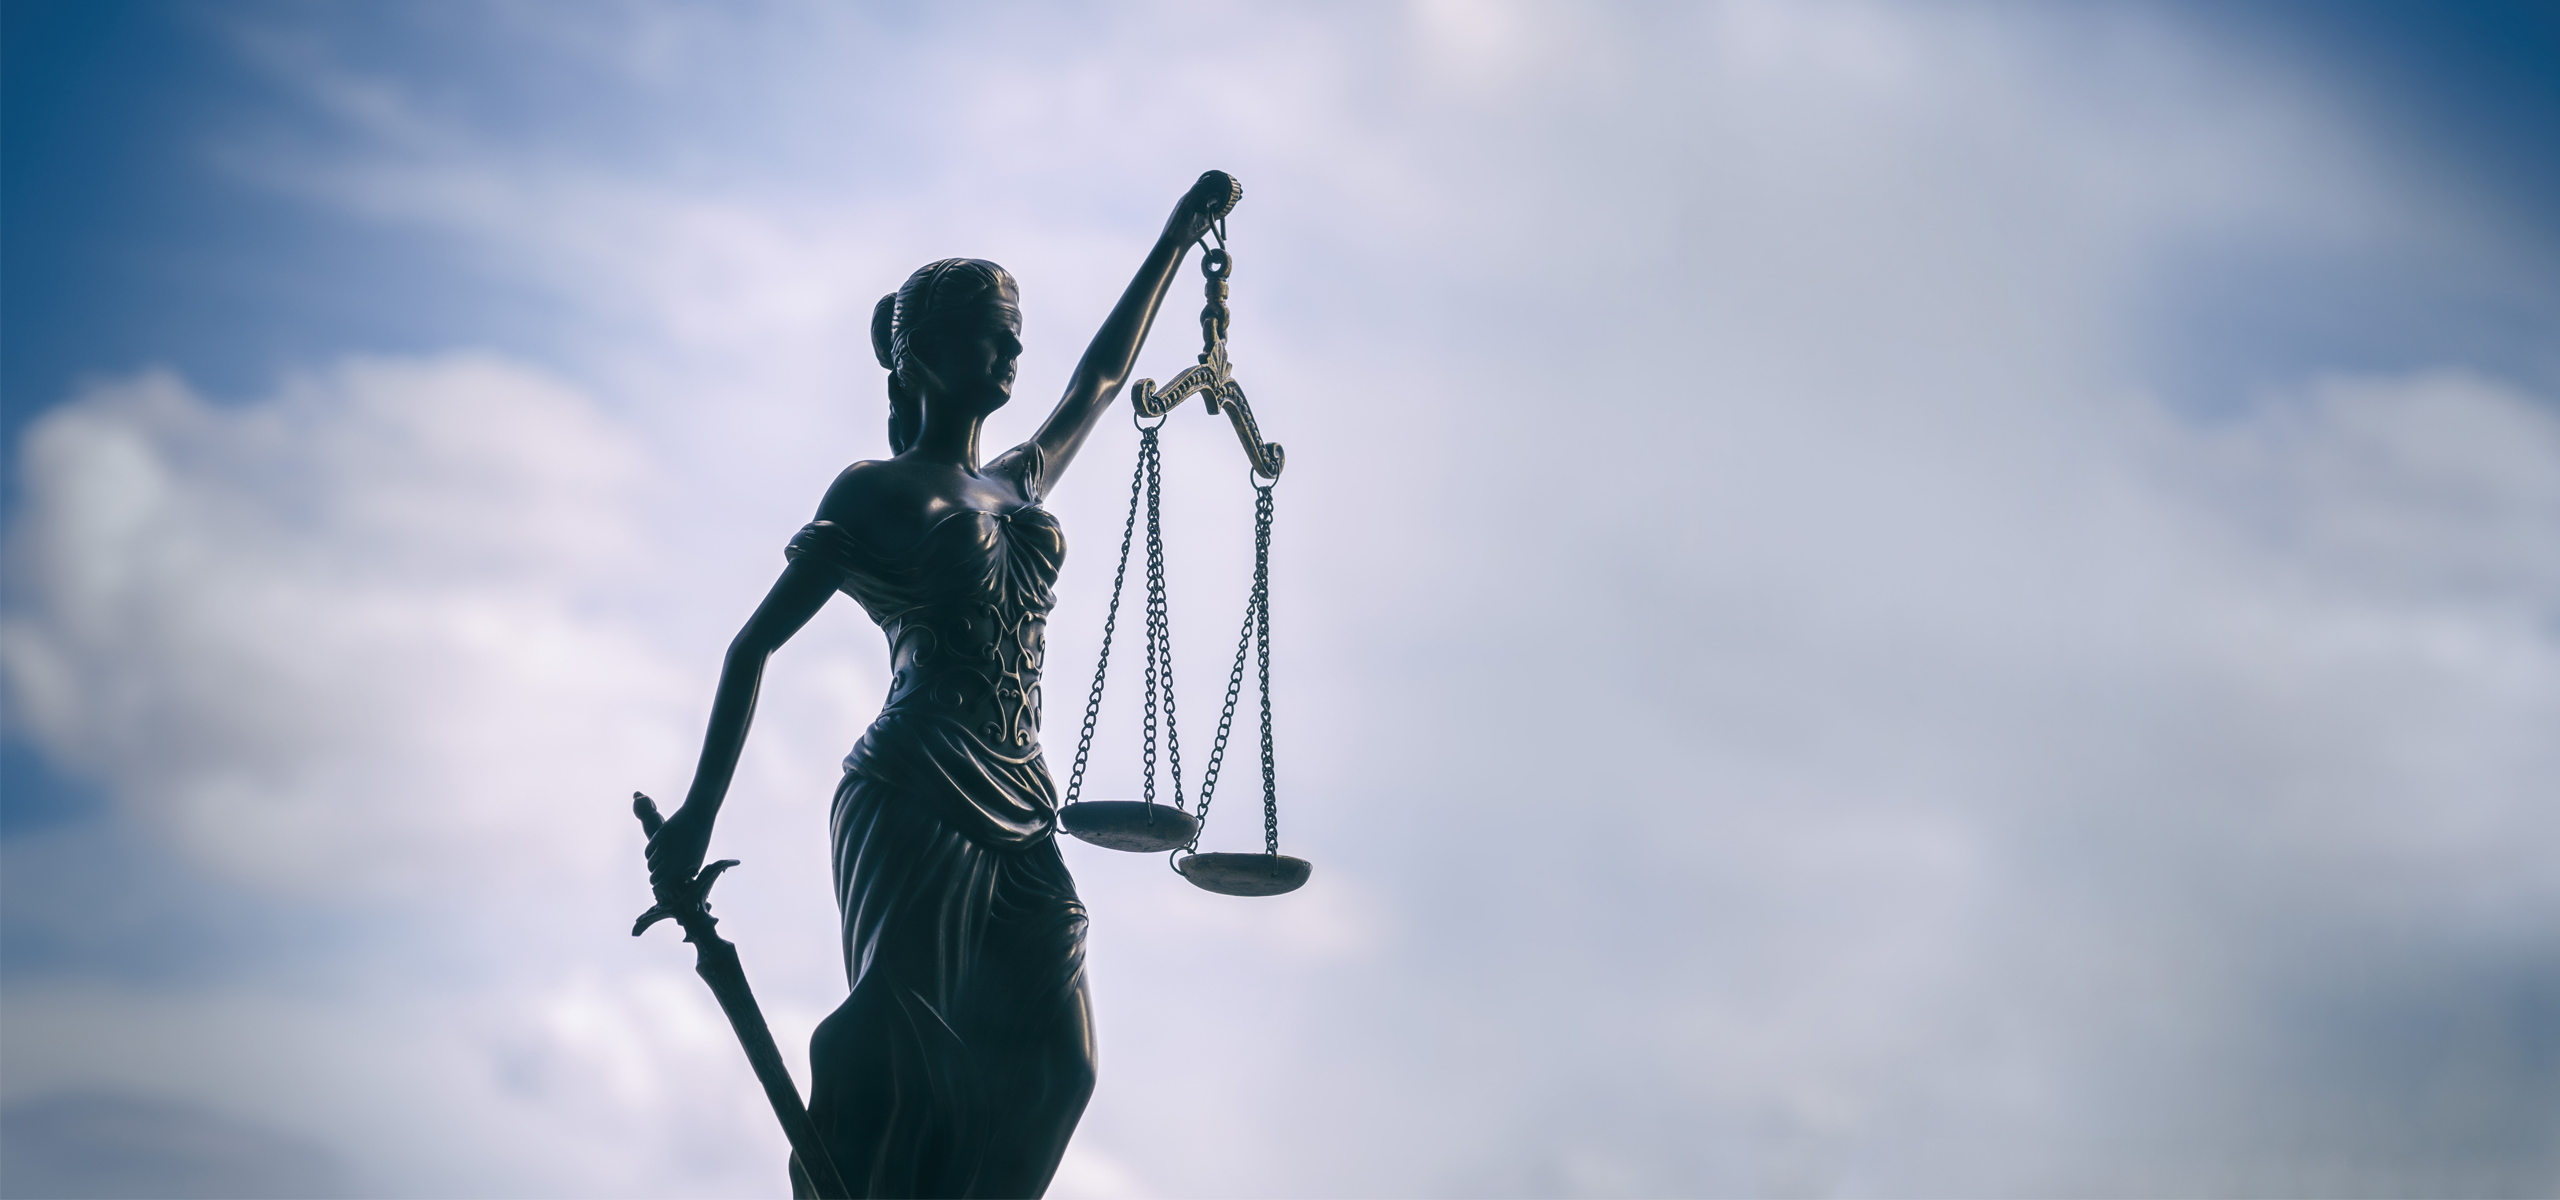 ral-familienrecht-header